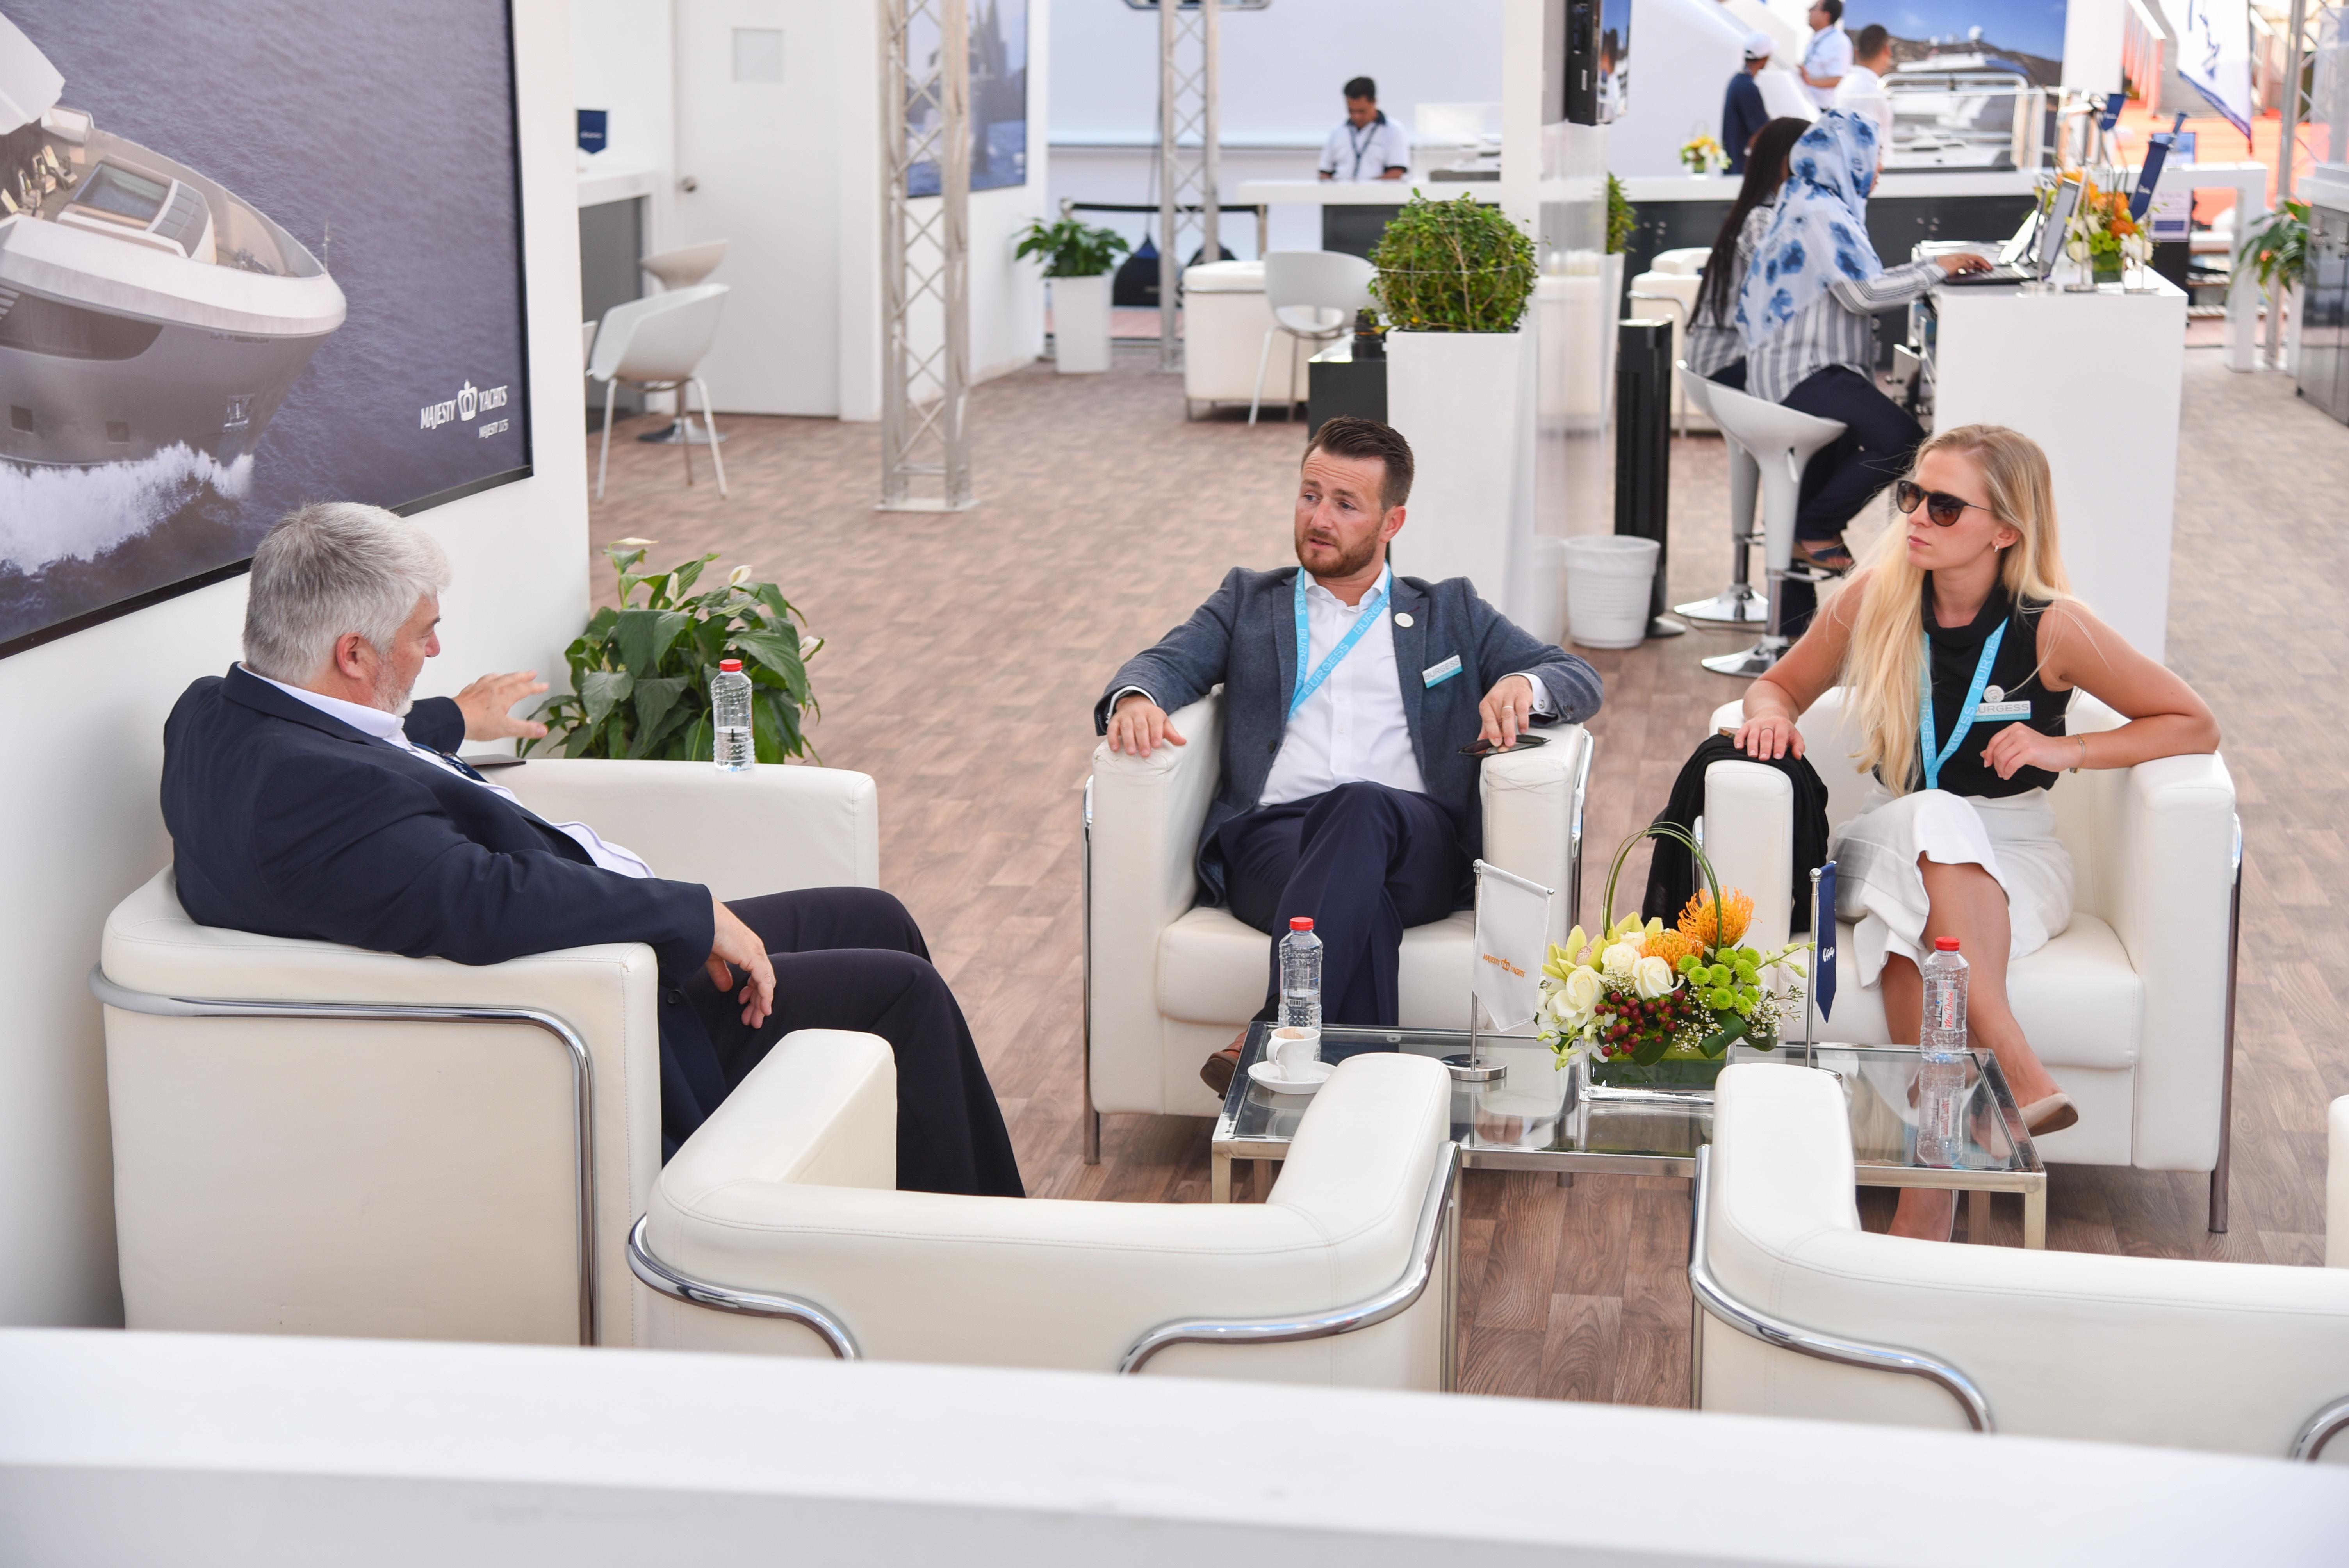 Gulf Craft at Abu Dhabi Boat Show 2018 Day 3 (7).jpg